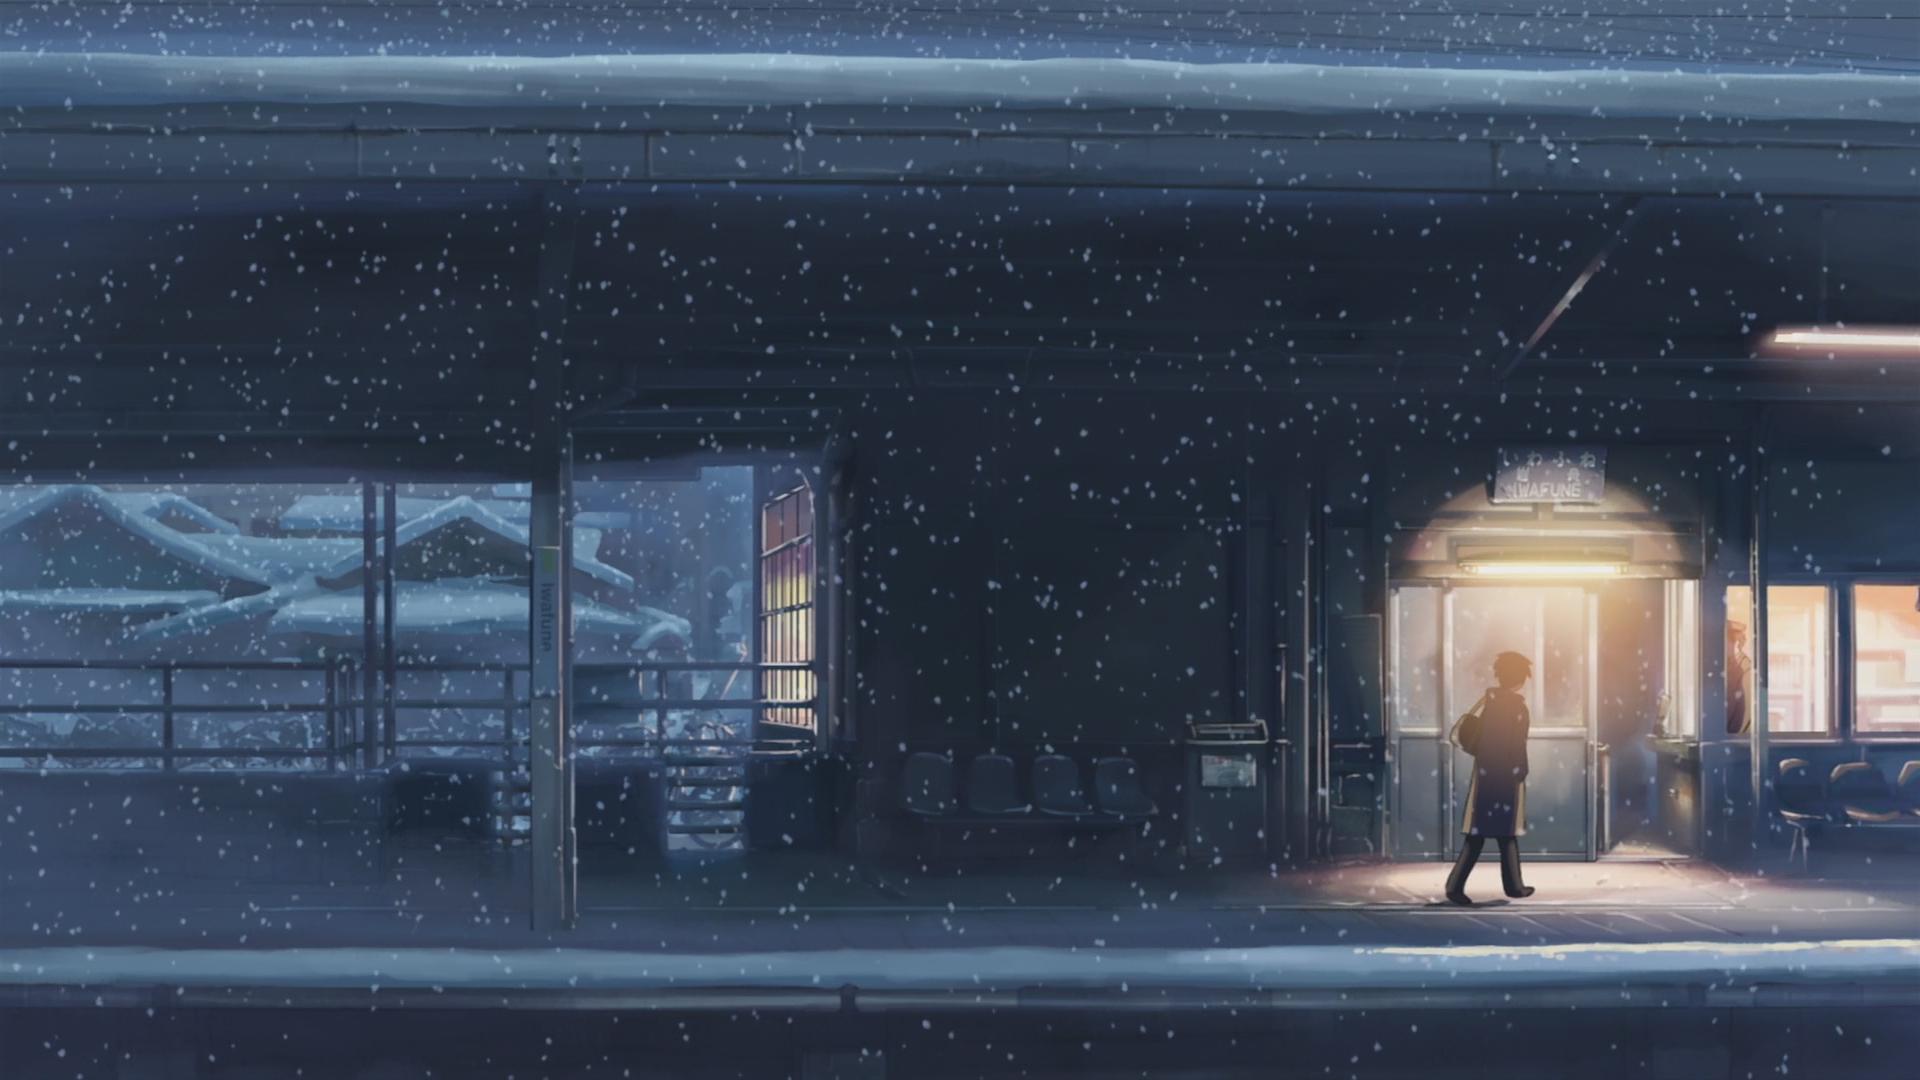 Snow 5 Centimeters Per Second Train Station Makoto Shinkai Anime Night Wallpaper